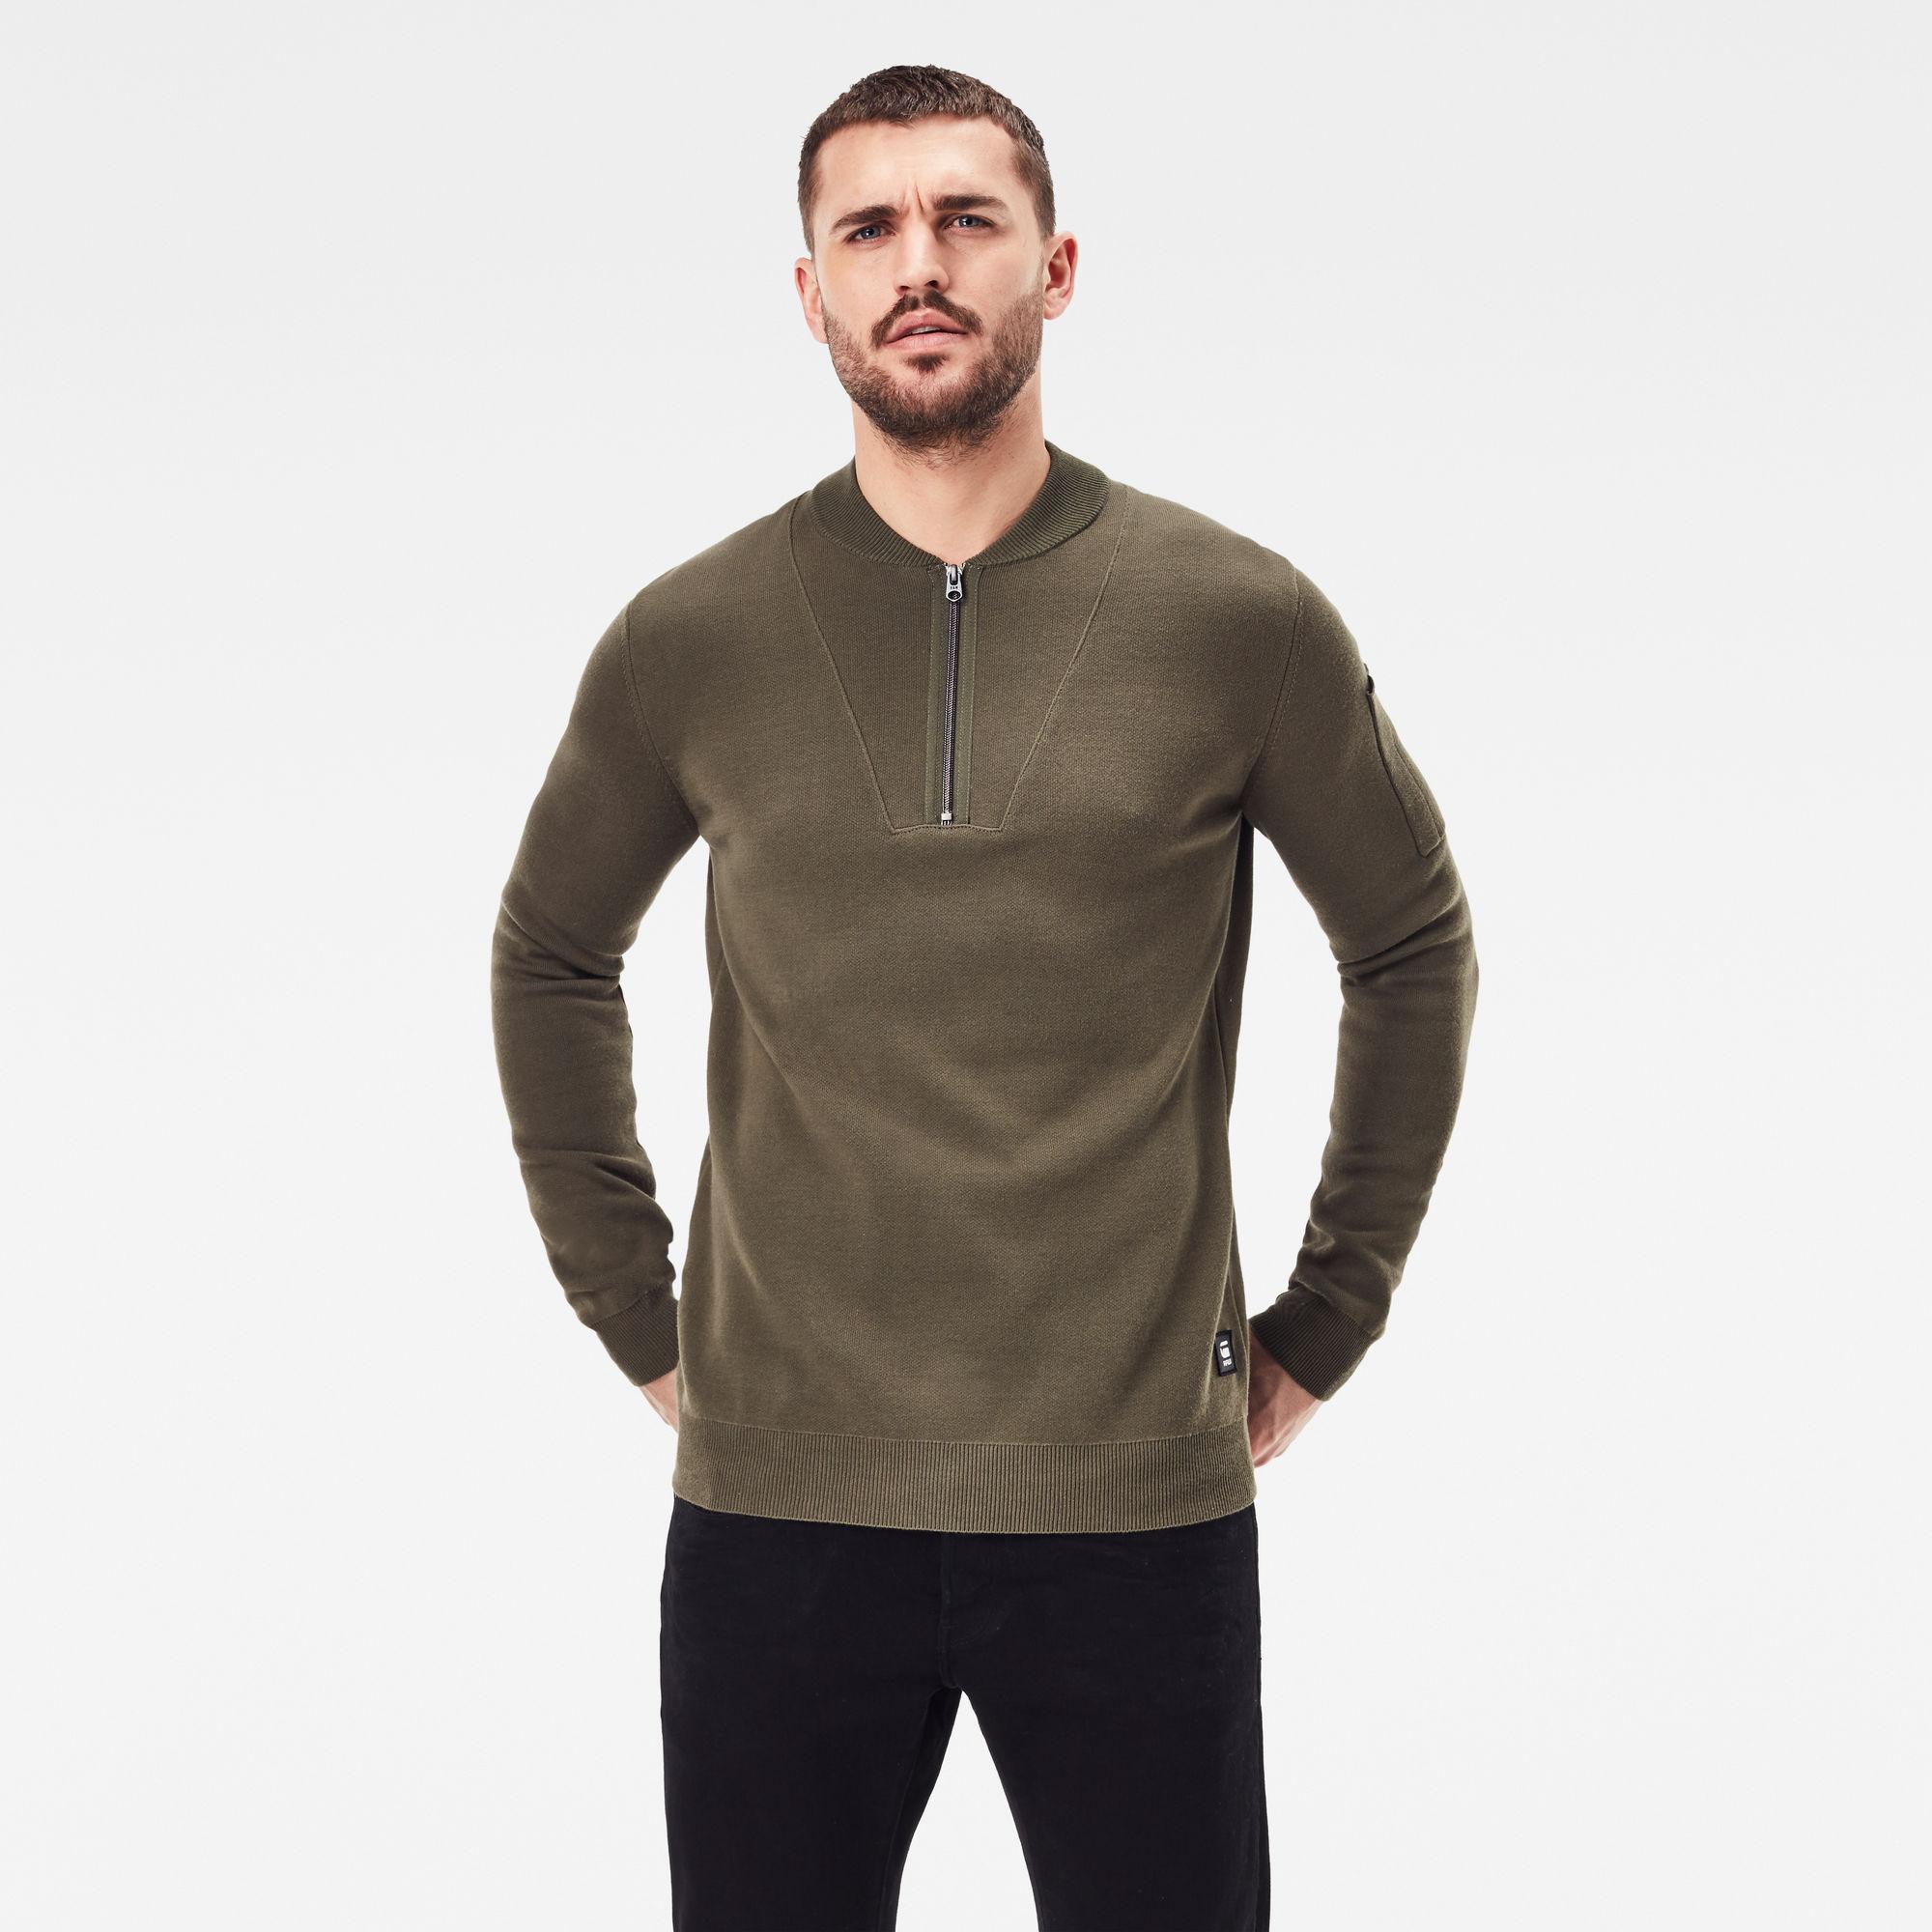 G-Star RAW Heren Sleeve Pocket Half Zip knitted Sweater Groen